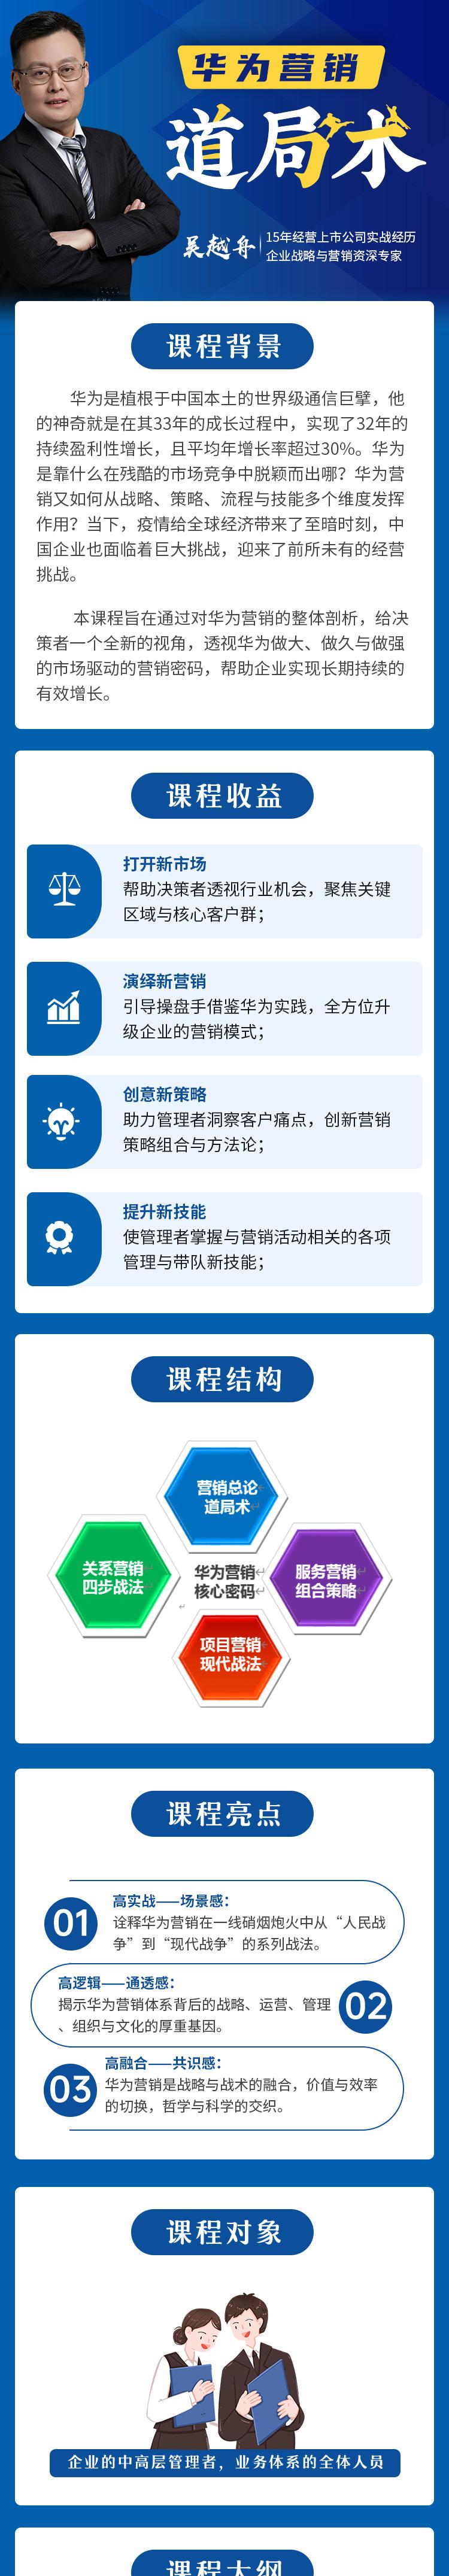 2cbd244f60e5fddadbaa4862c89c2a40 - 华为营销:道局术,学习华为营销,在市场竞争中脱颖而出?